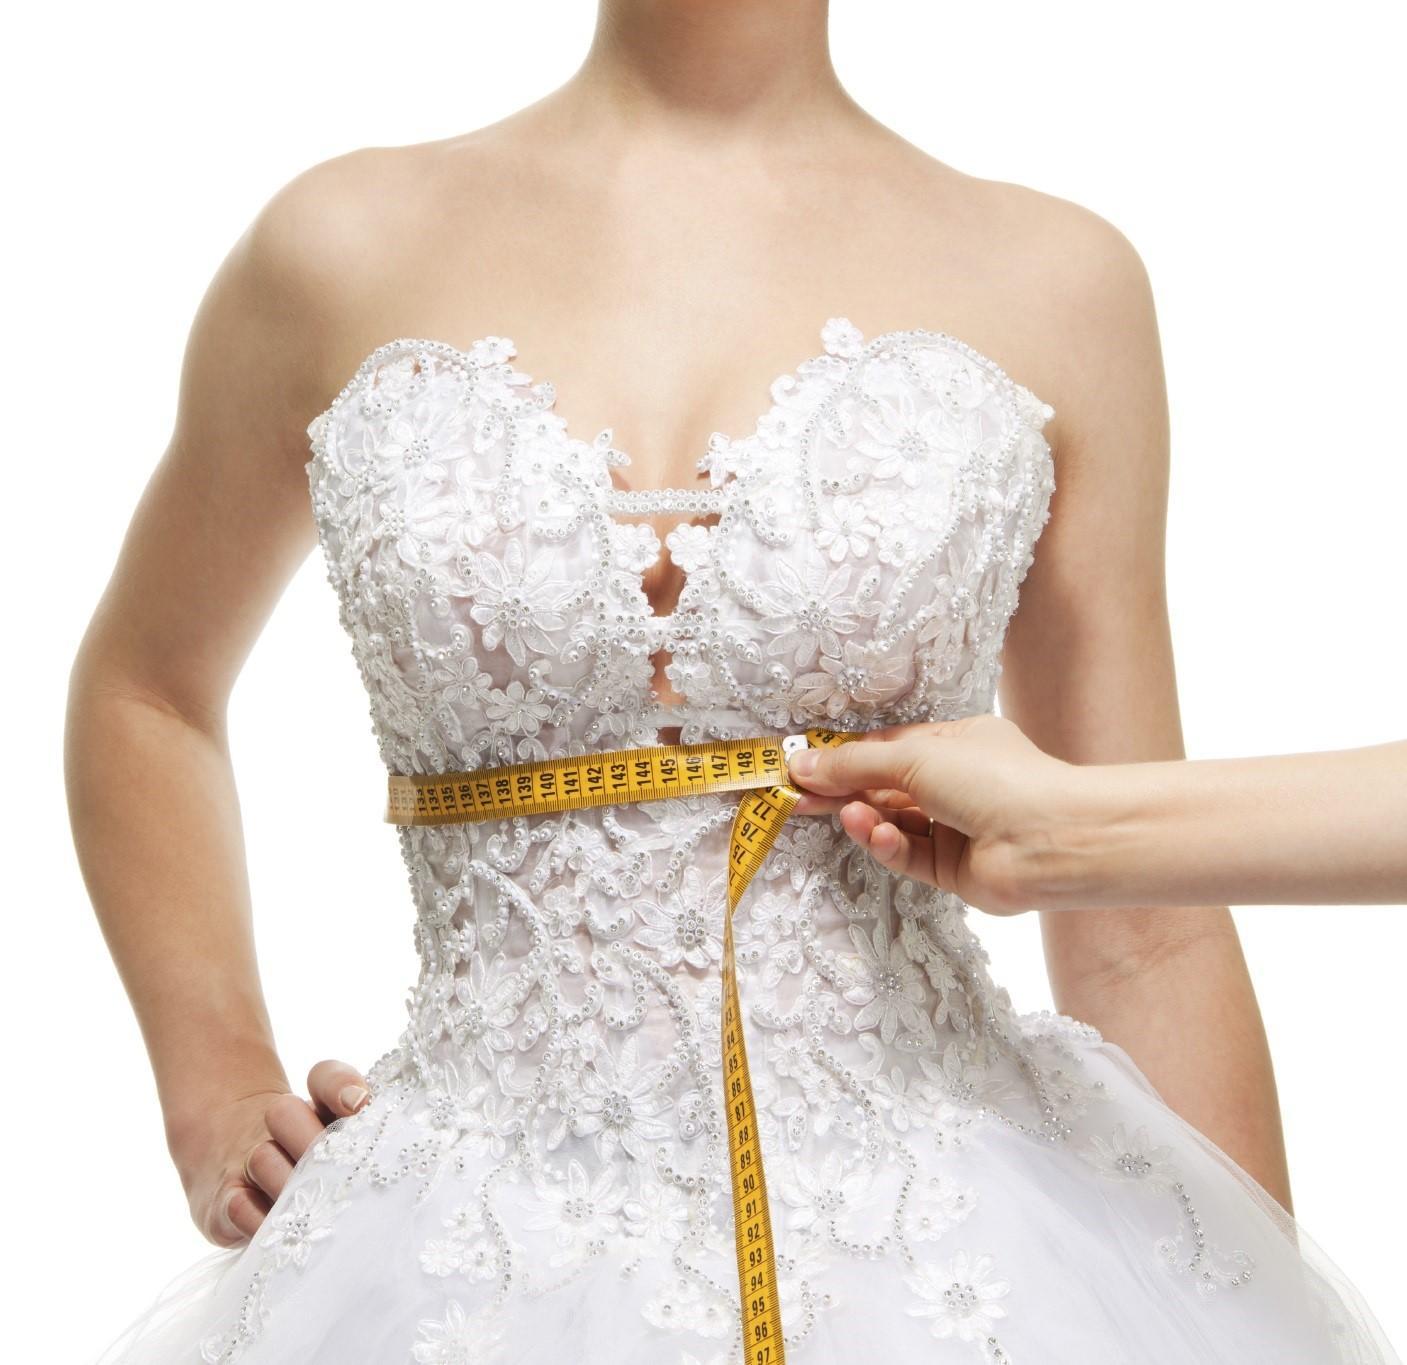 Chudneme do svadobných šiat - Fotka skupiny